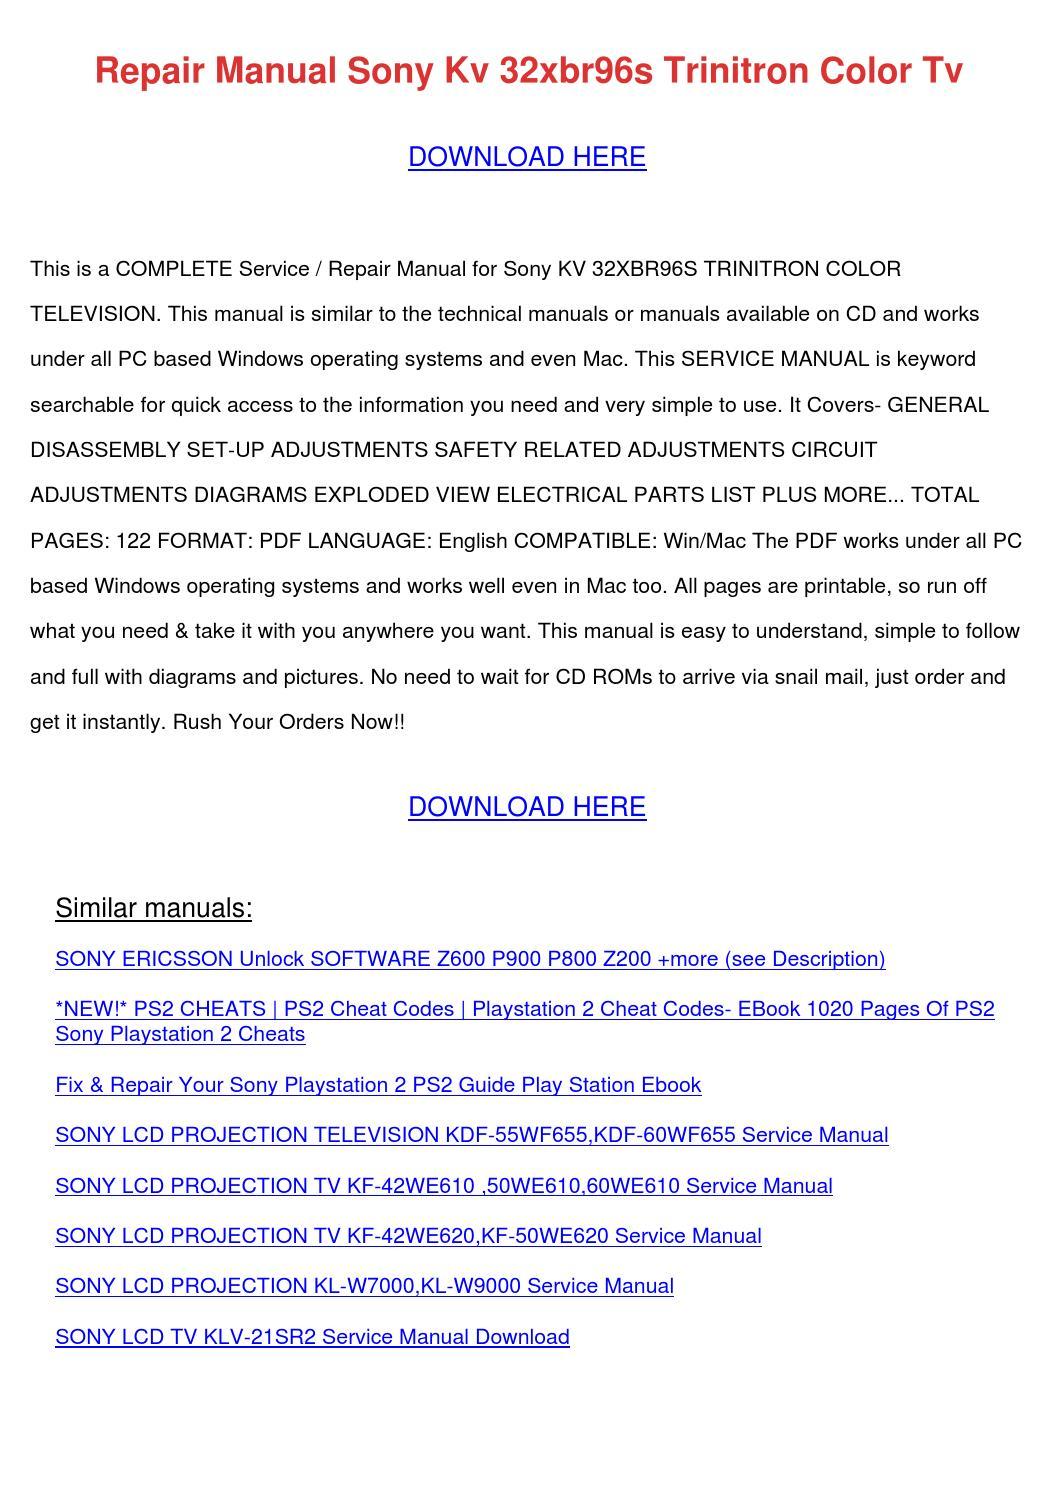 Repair Manual Sony Kv 32xbr96s Trinitron Colo By